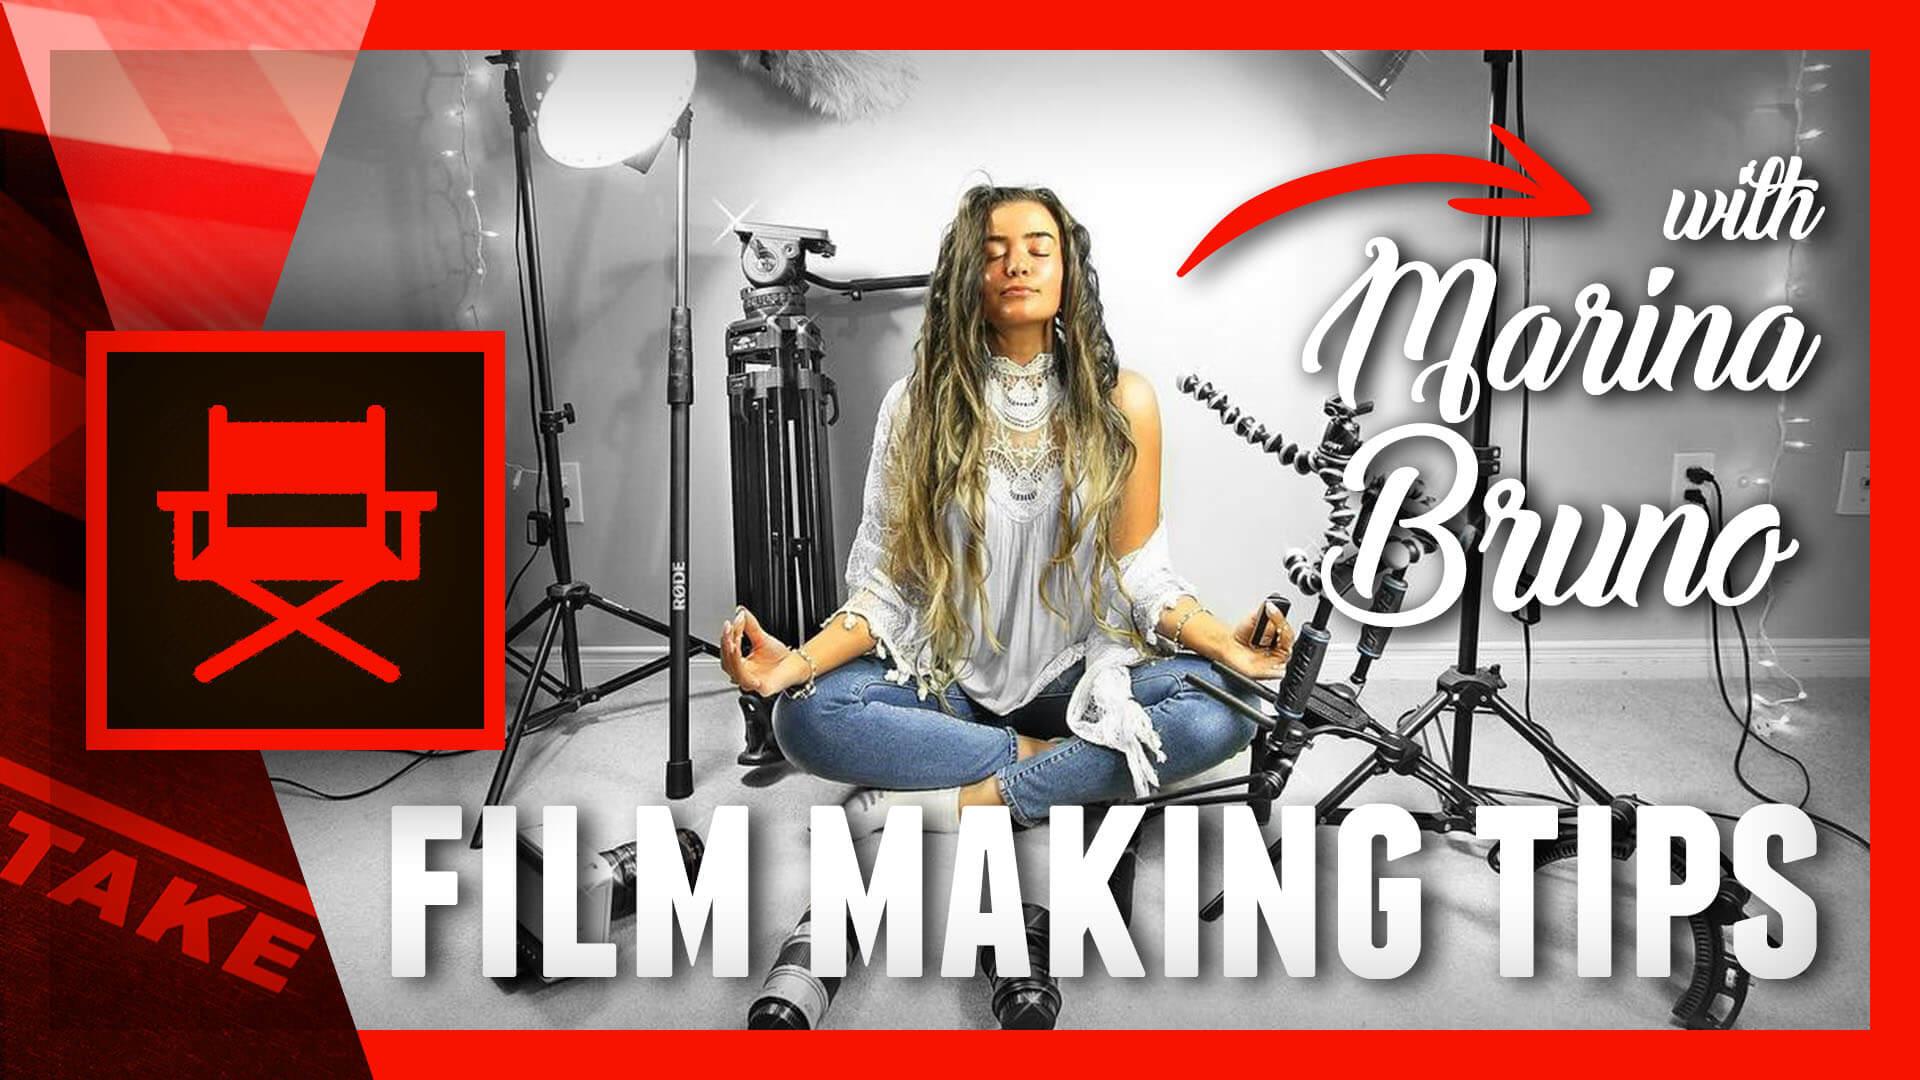 5 Tips for Beginner Filmmakers with Marina Bruno